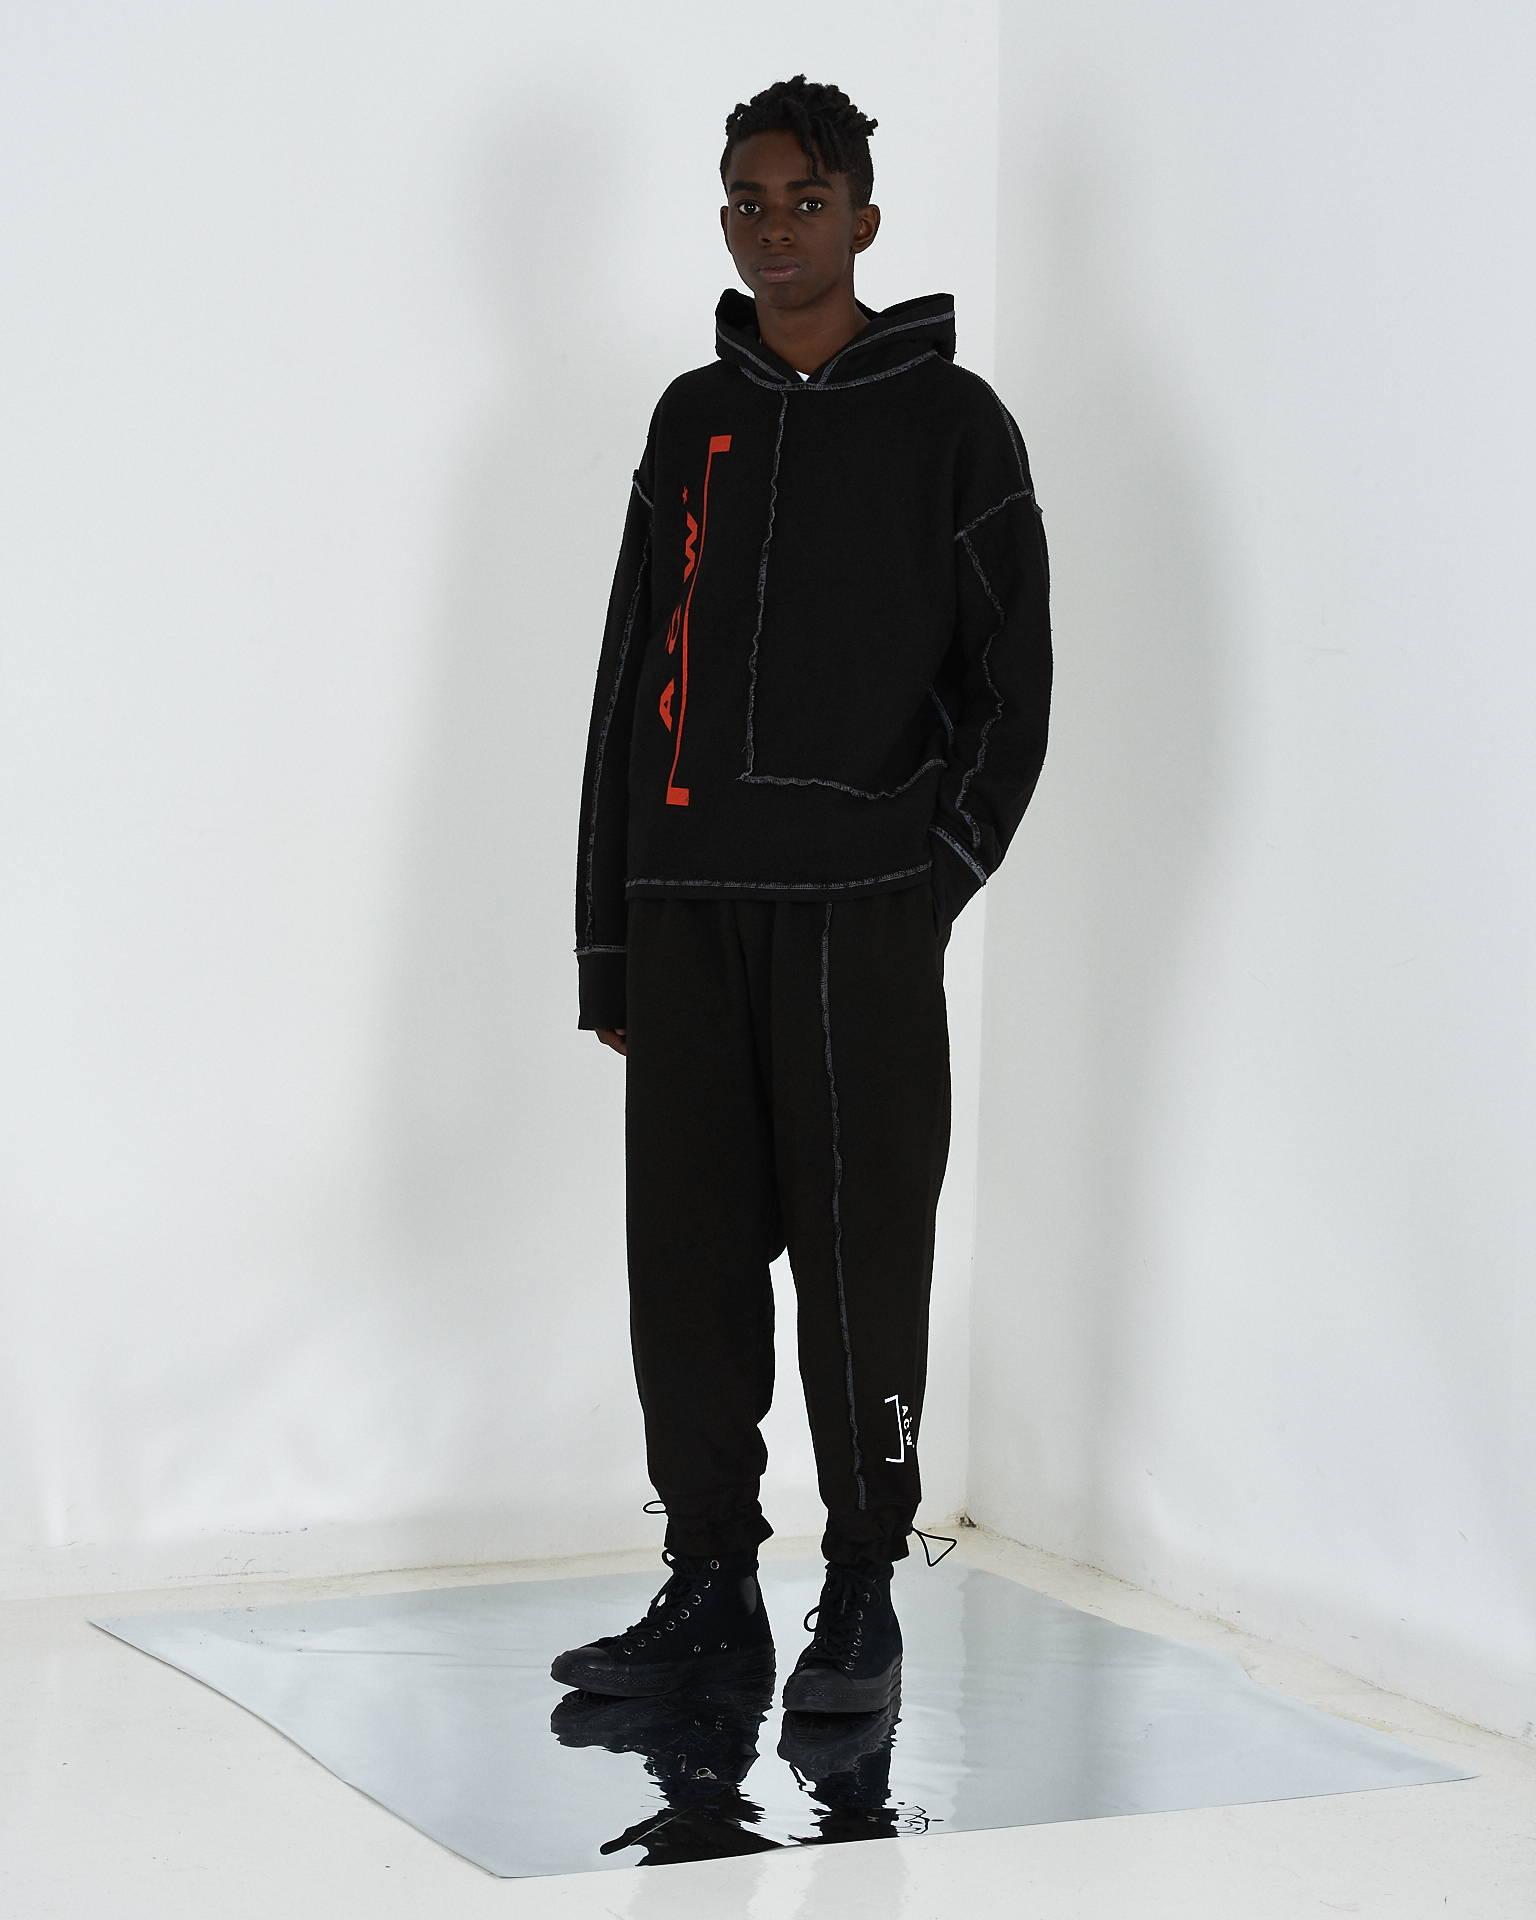 a c w tracksuit at h lorenzo menswear